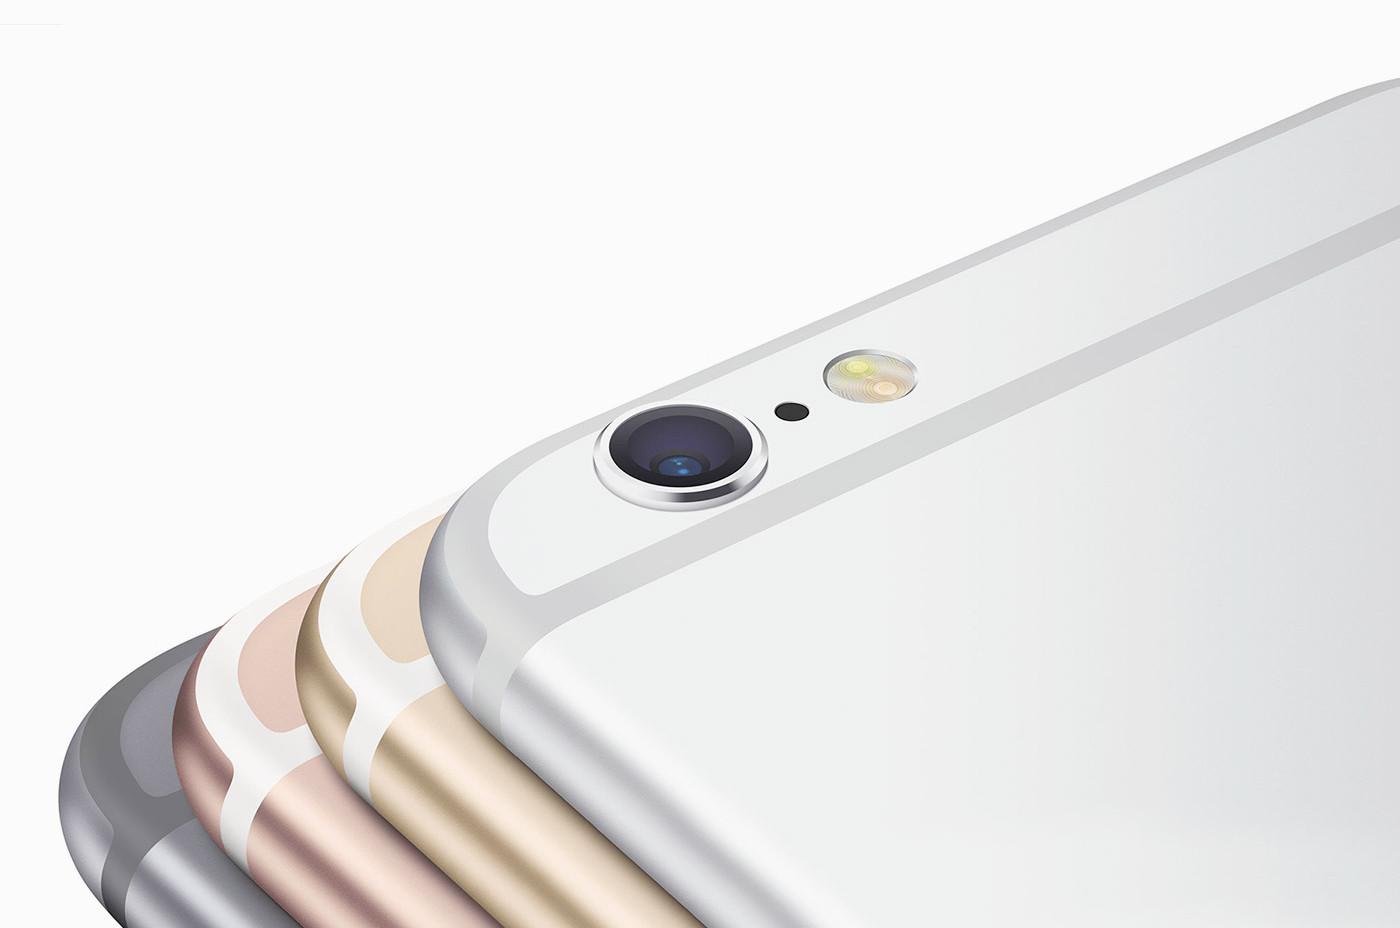 iphone-6s-rosegold